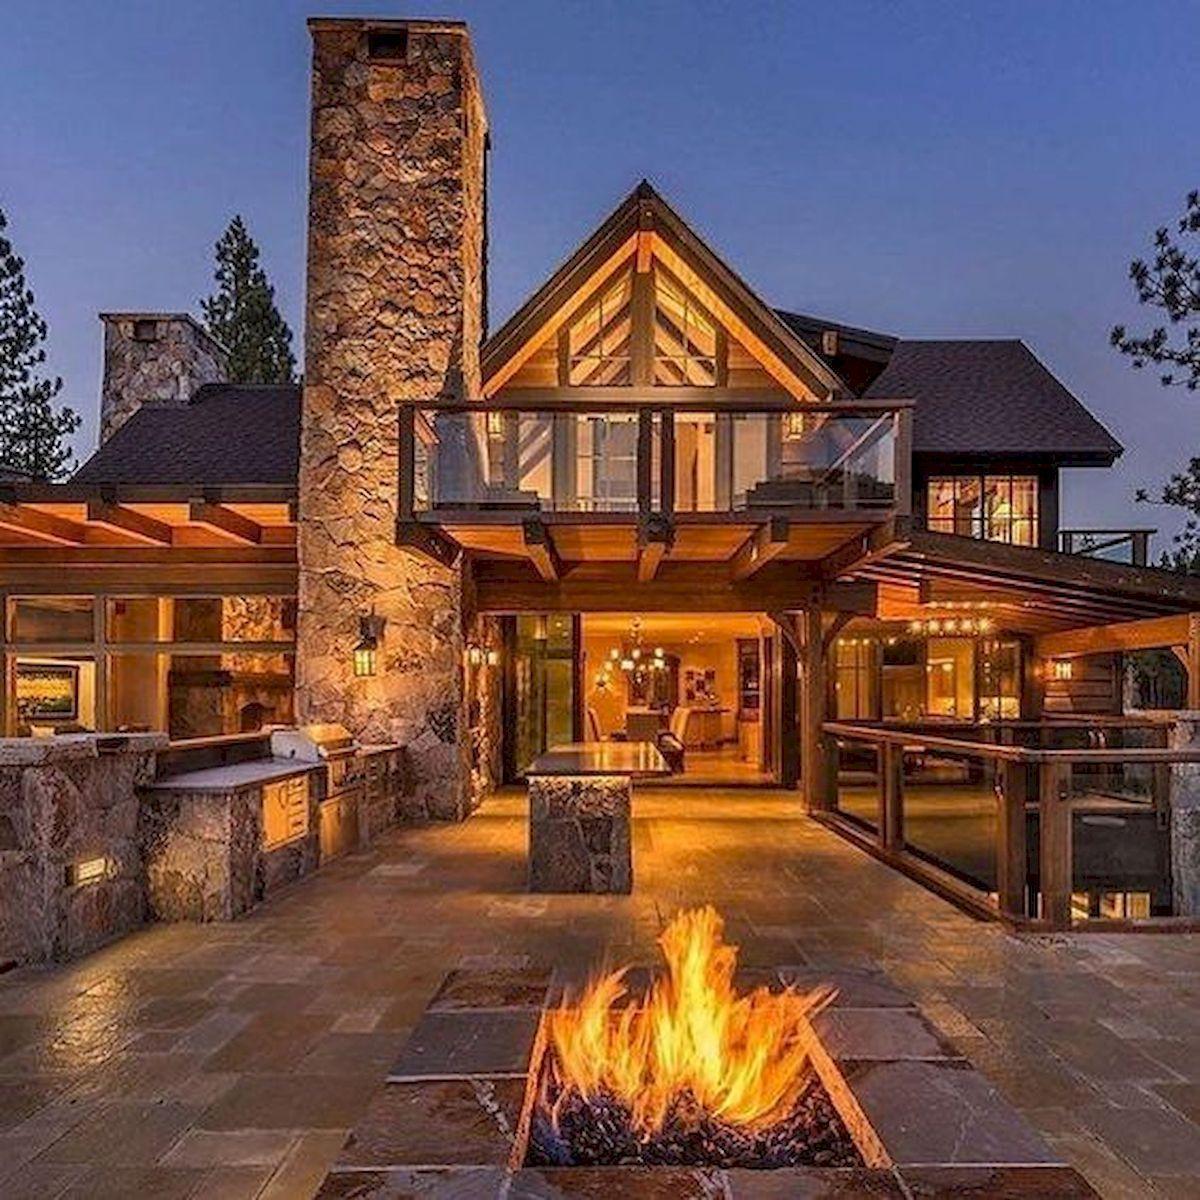 50 Best Log Cabin Homes Modern Design Ideas 37 House Exterior